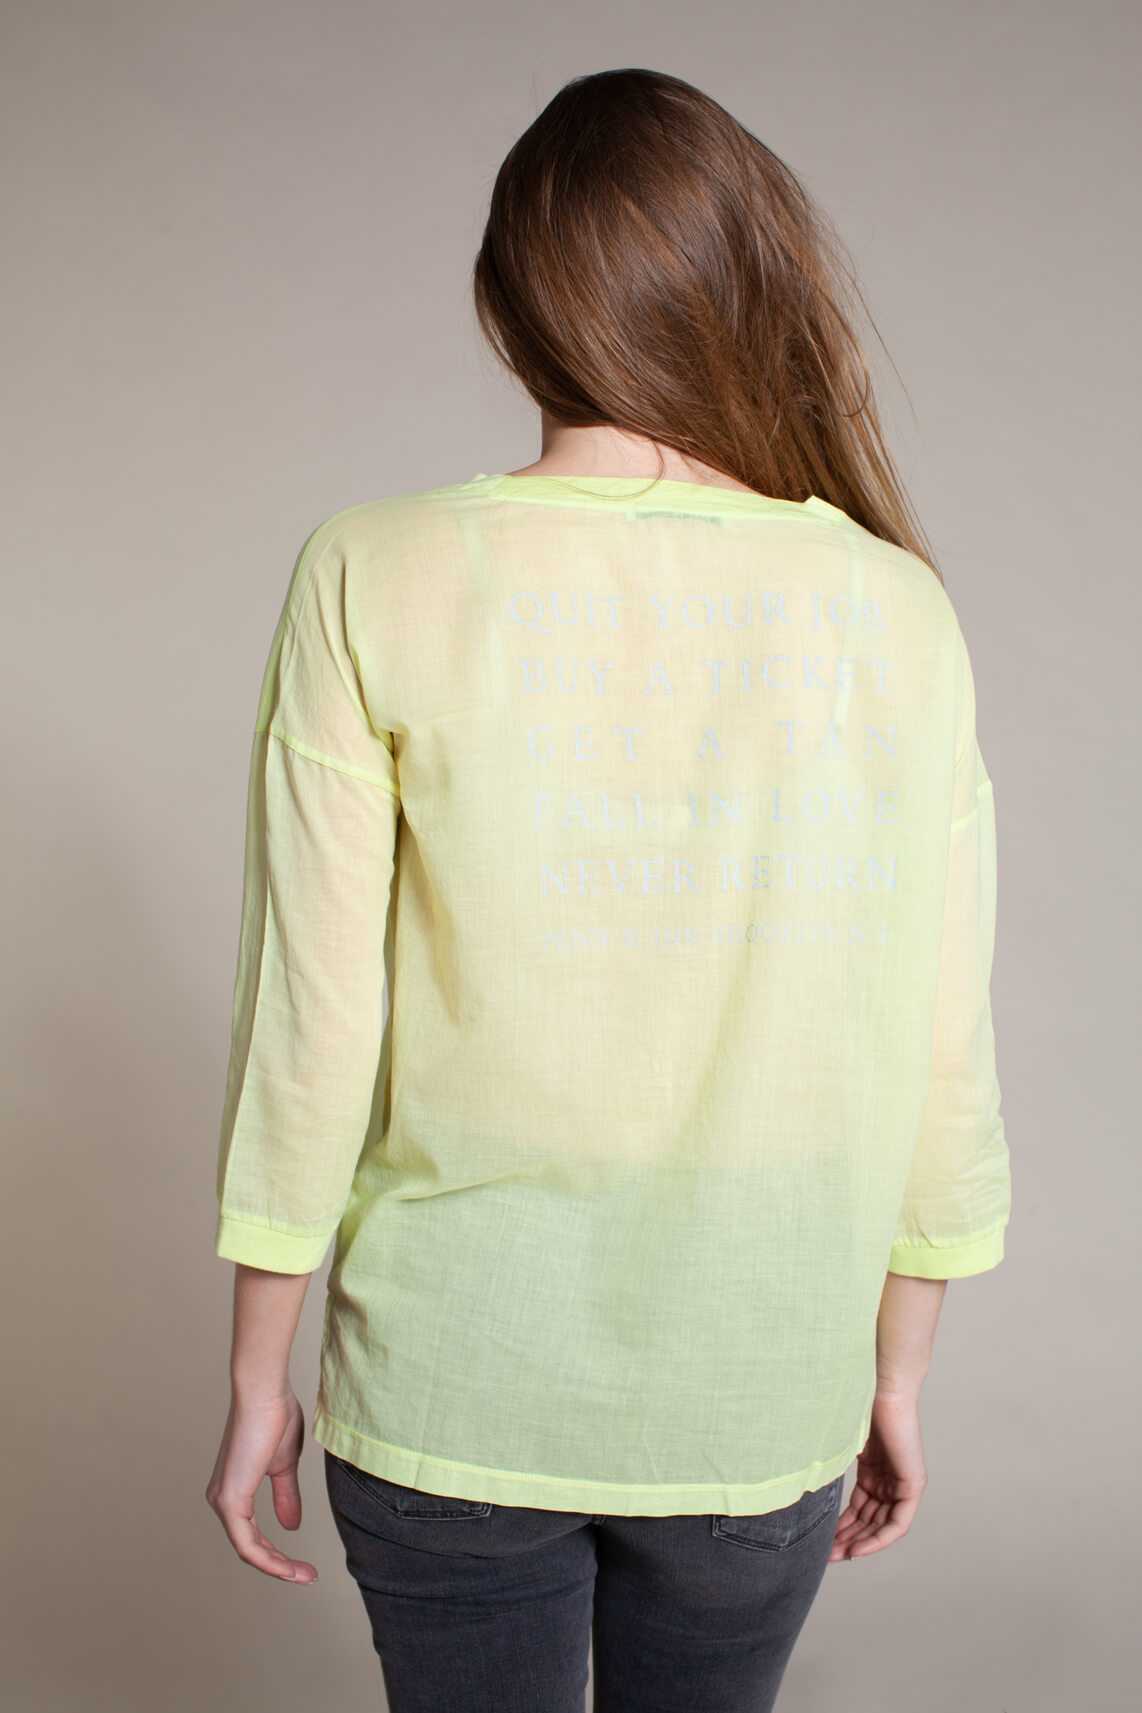 Penn & Ink Dames Shirt met v-hals geel